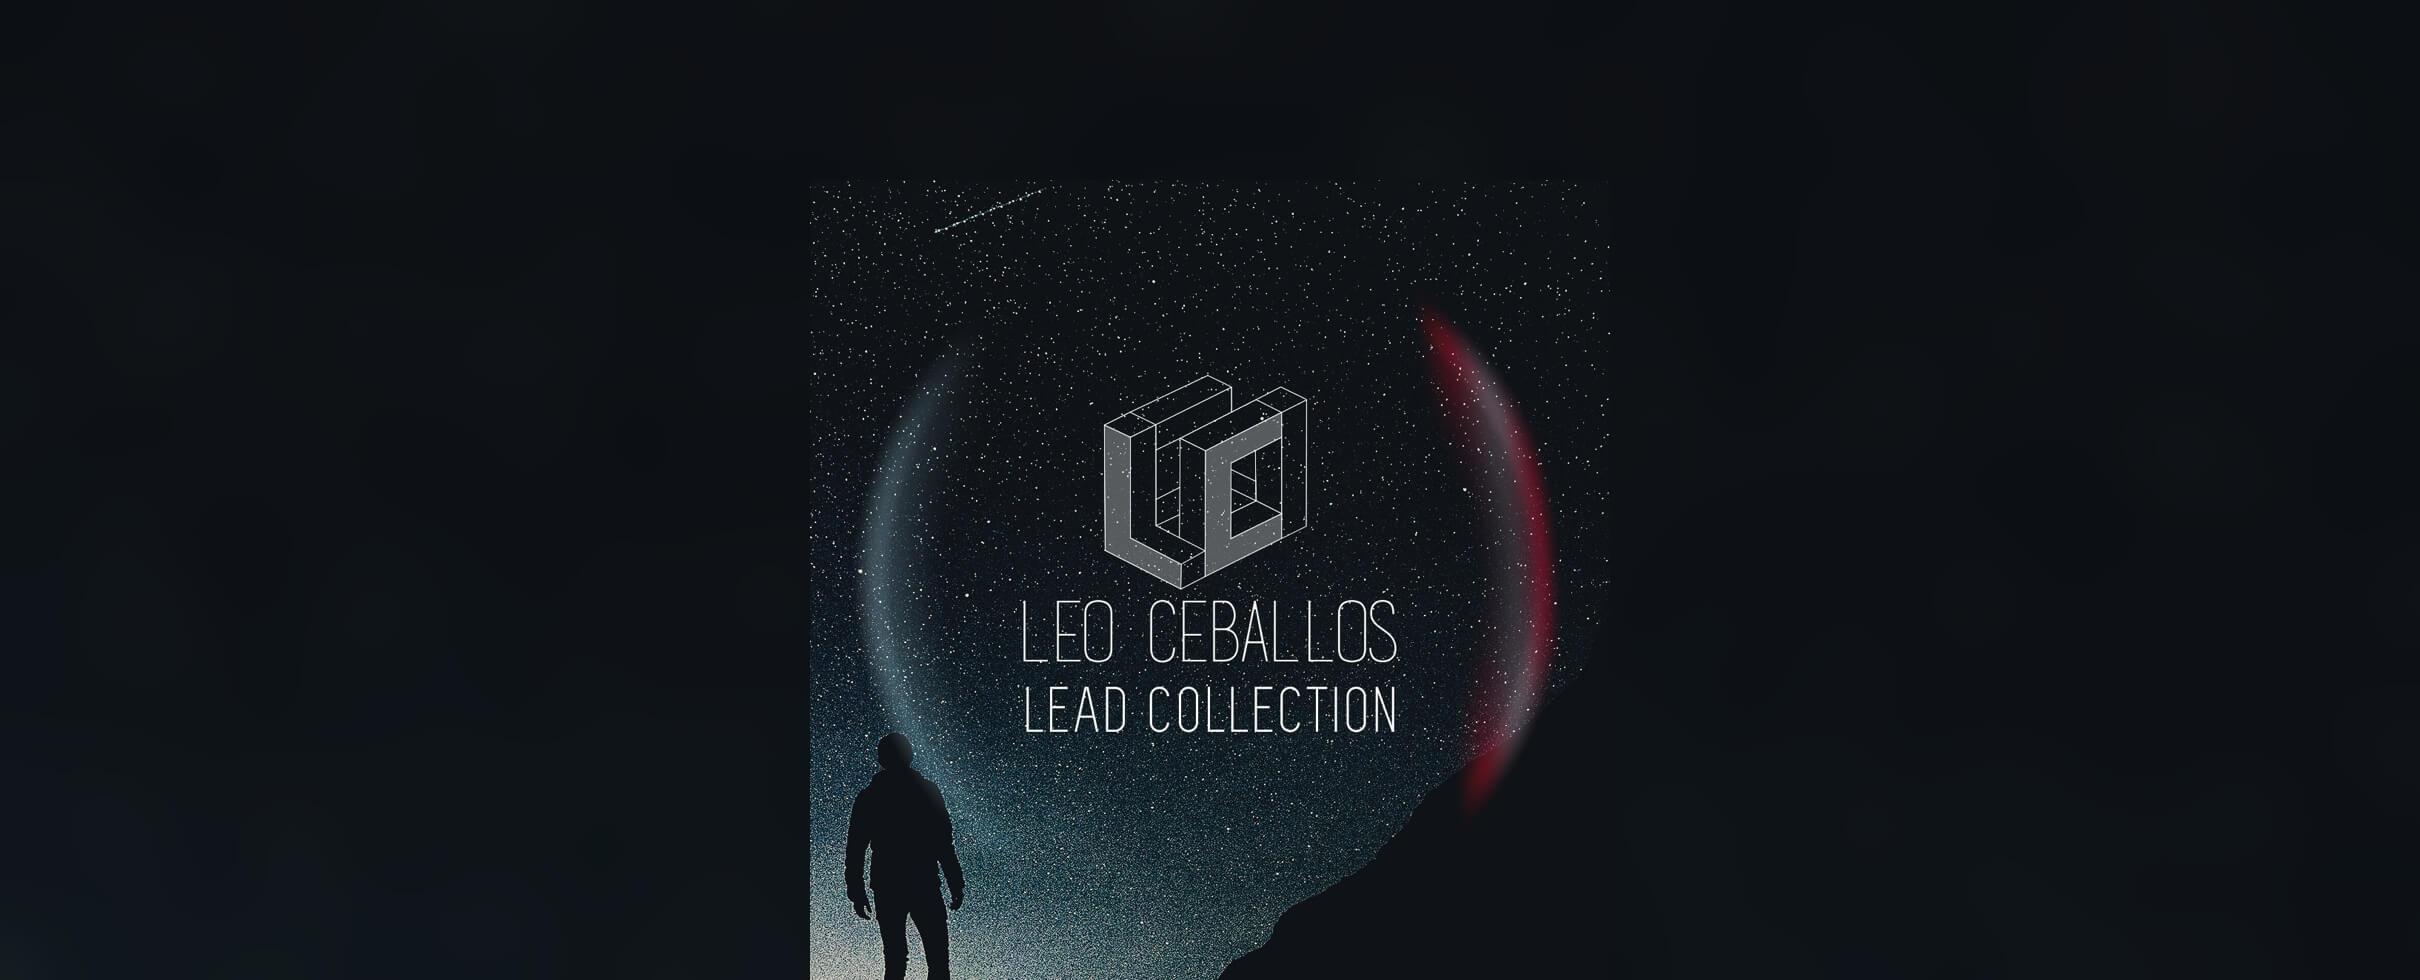 <h1>Lead Collection</h1> <strong>Leo Ceballos</strong>